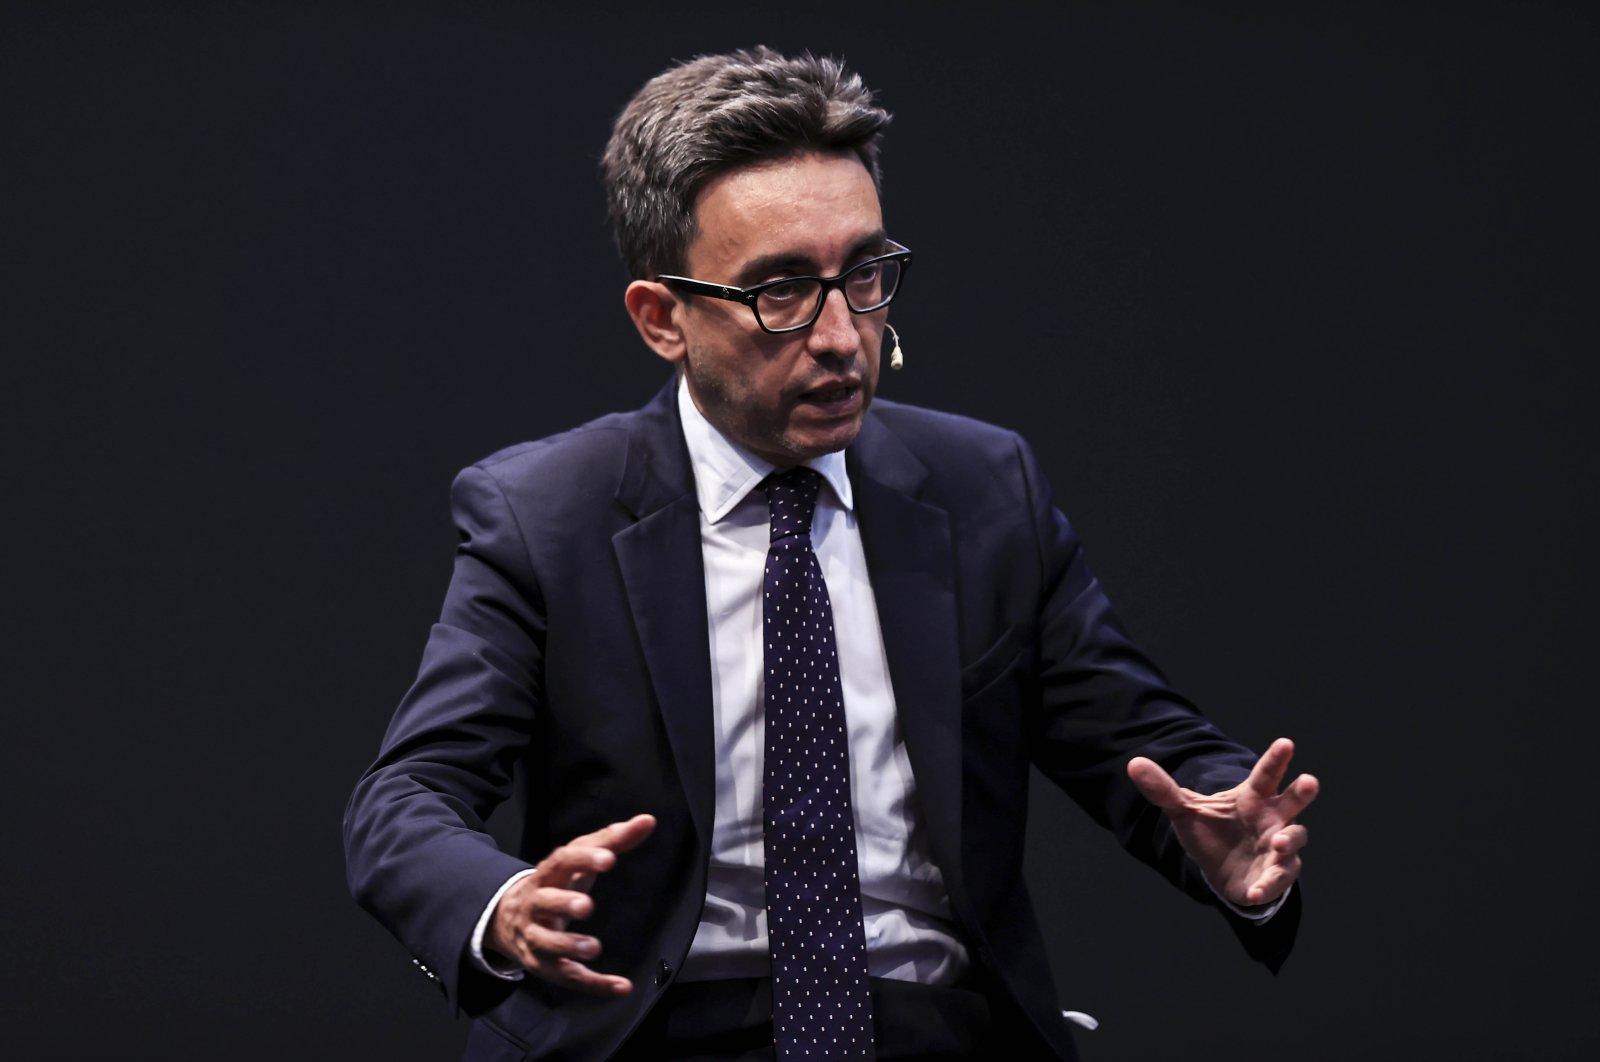 Former Portuguese Minister Bruno Macaes speaks at the Antalya Diplomacy Forum in Antalya, Turkey, Sunday, June 20, 2021. (AA Photo)